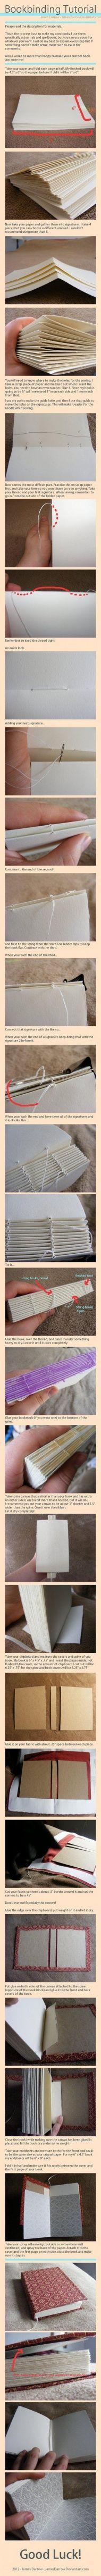 jak zrobić samemu książkę albo notes :)